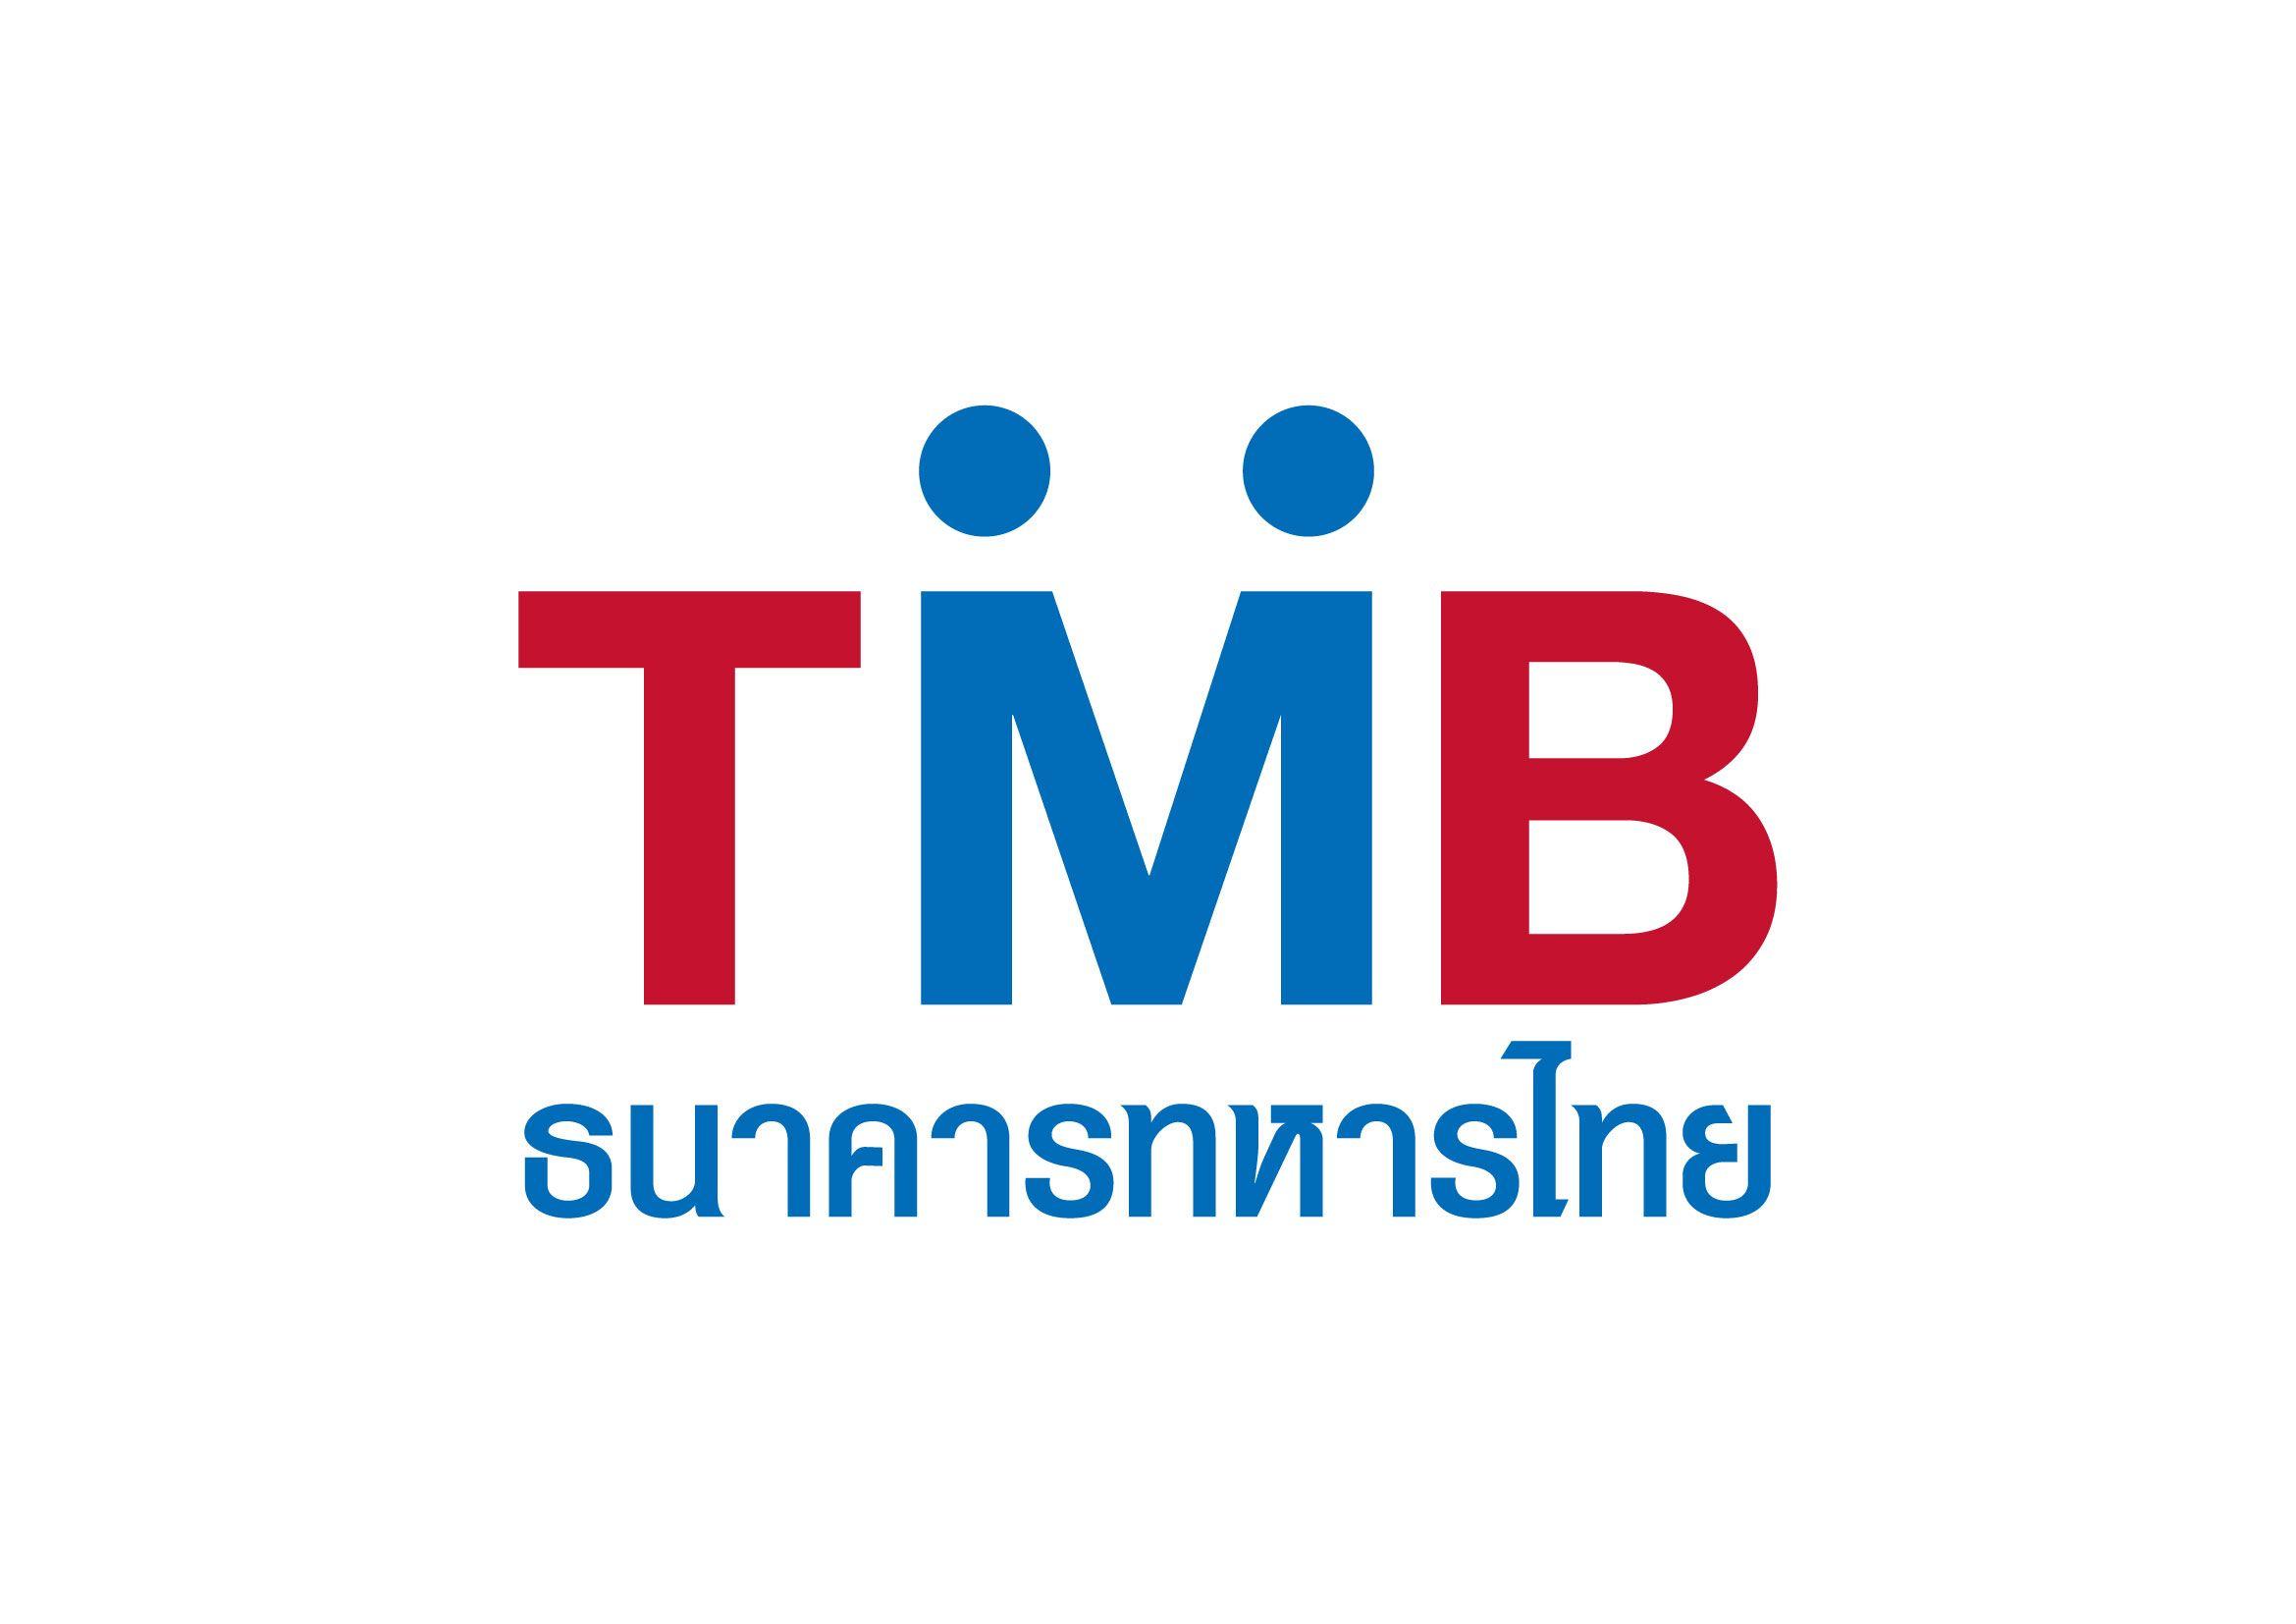 tmb bank - Google Search   ปาร์ตี้มินนี่เมาส์, โลโก้วินเทจ, การออกแบบนามบัตร